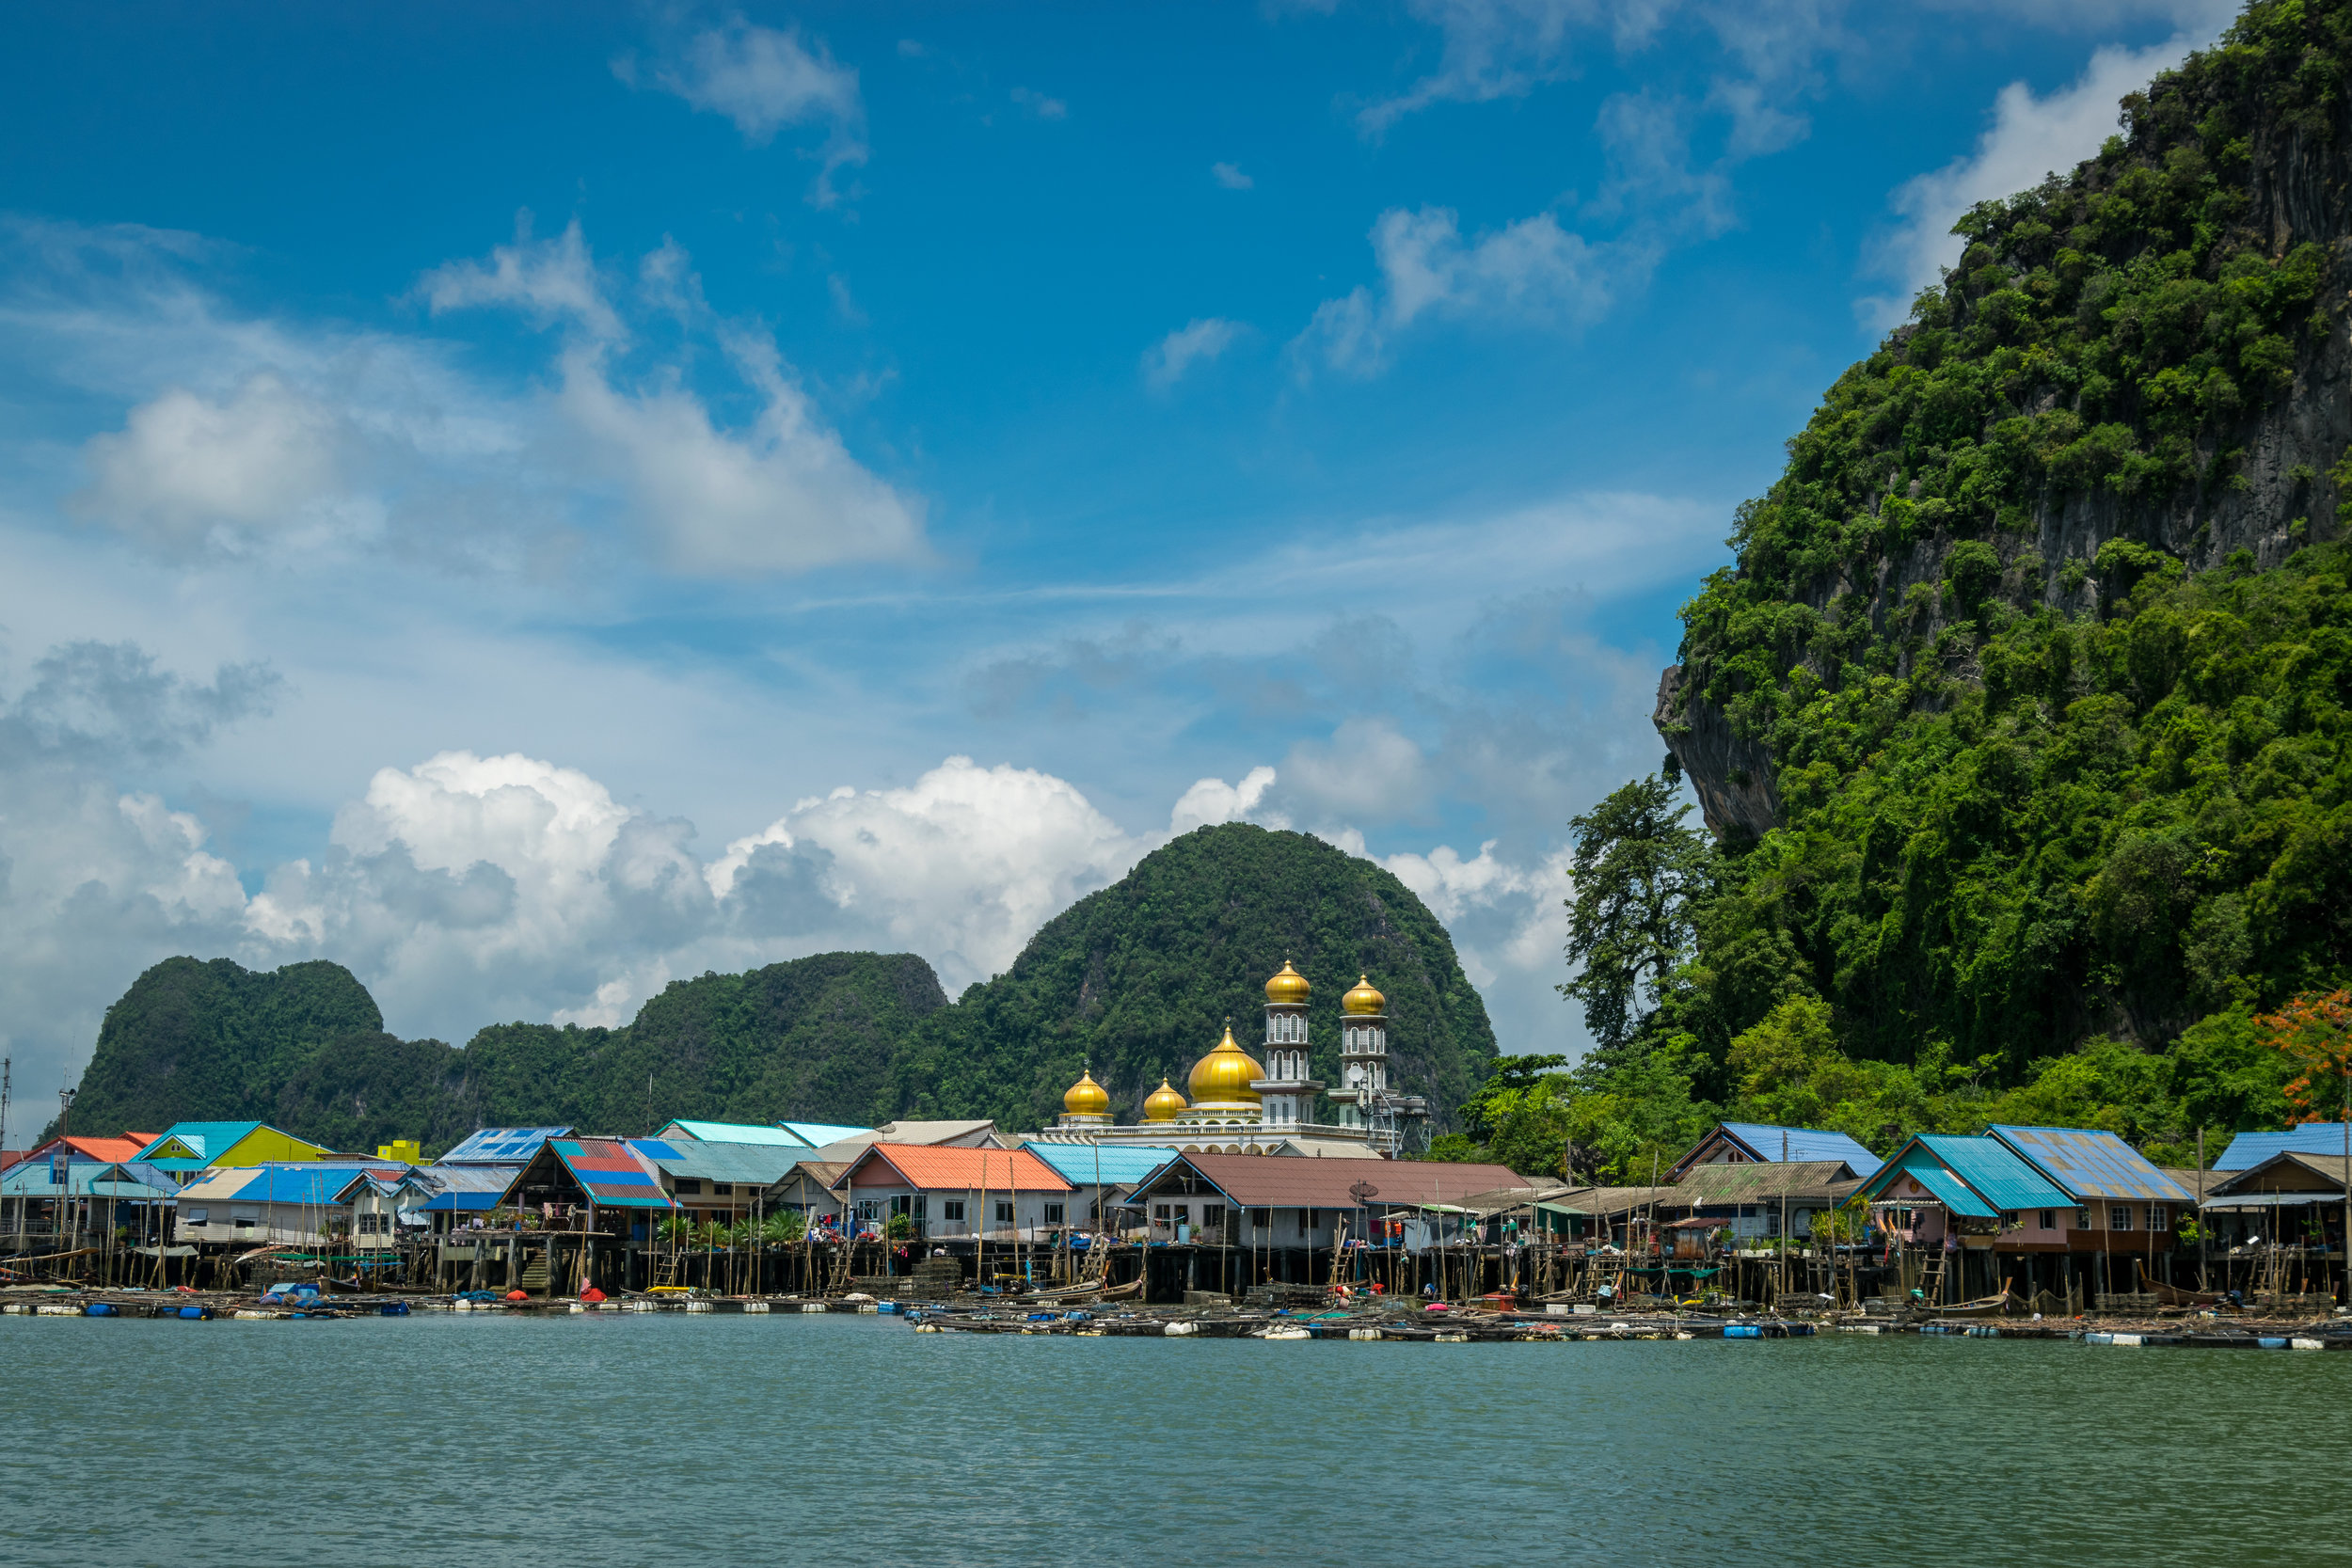 Phuket islands_Koh Panyee-1.jpg